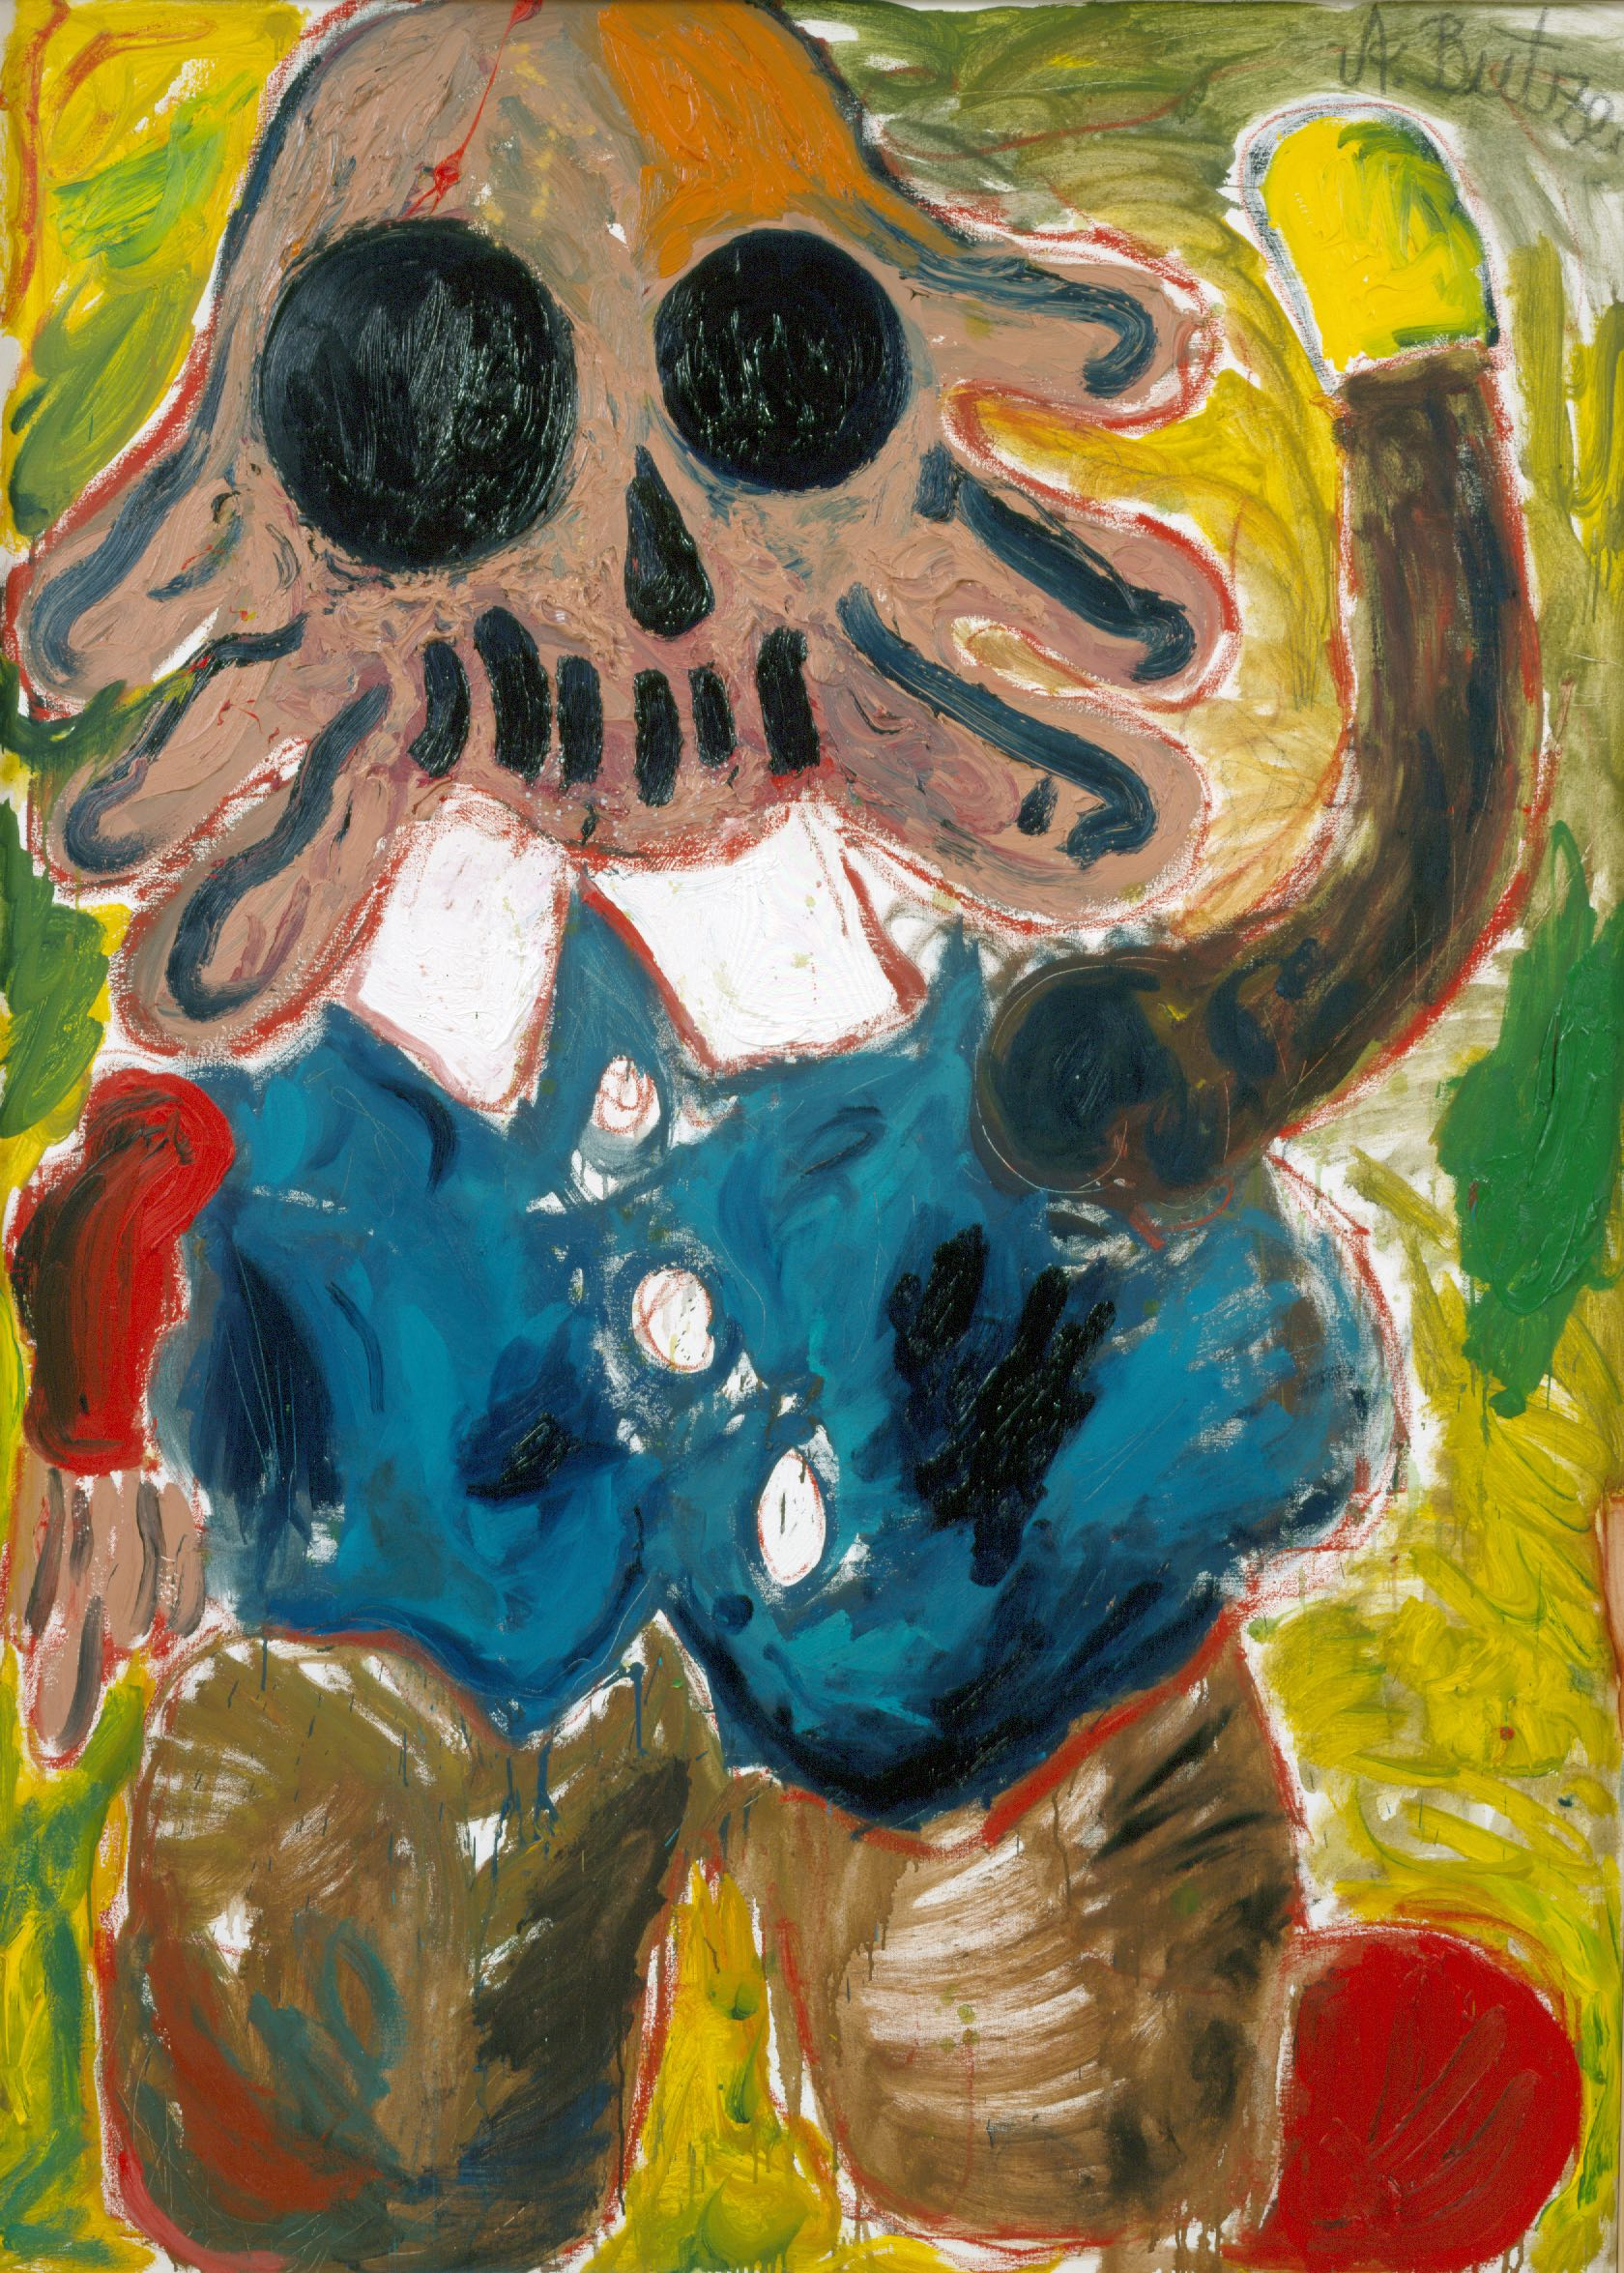 André Butzer, Vater von Mirinda (Bleod Stumpf), 2003 Private Collection, Courtesy of Galerie Max Hetzler, Berlin I Paris